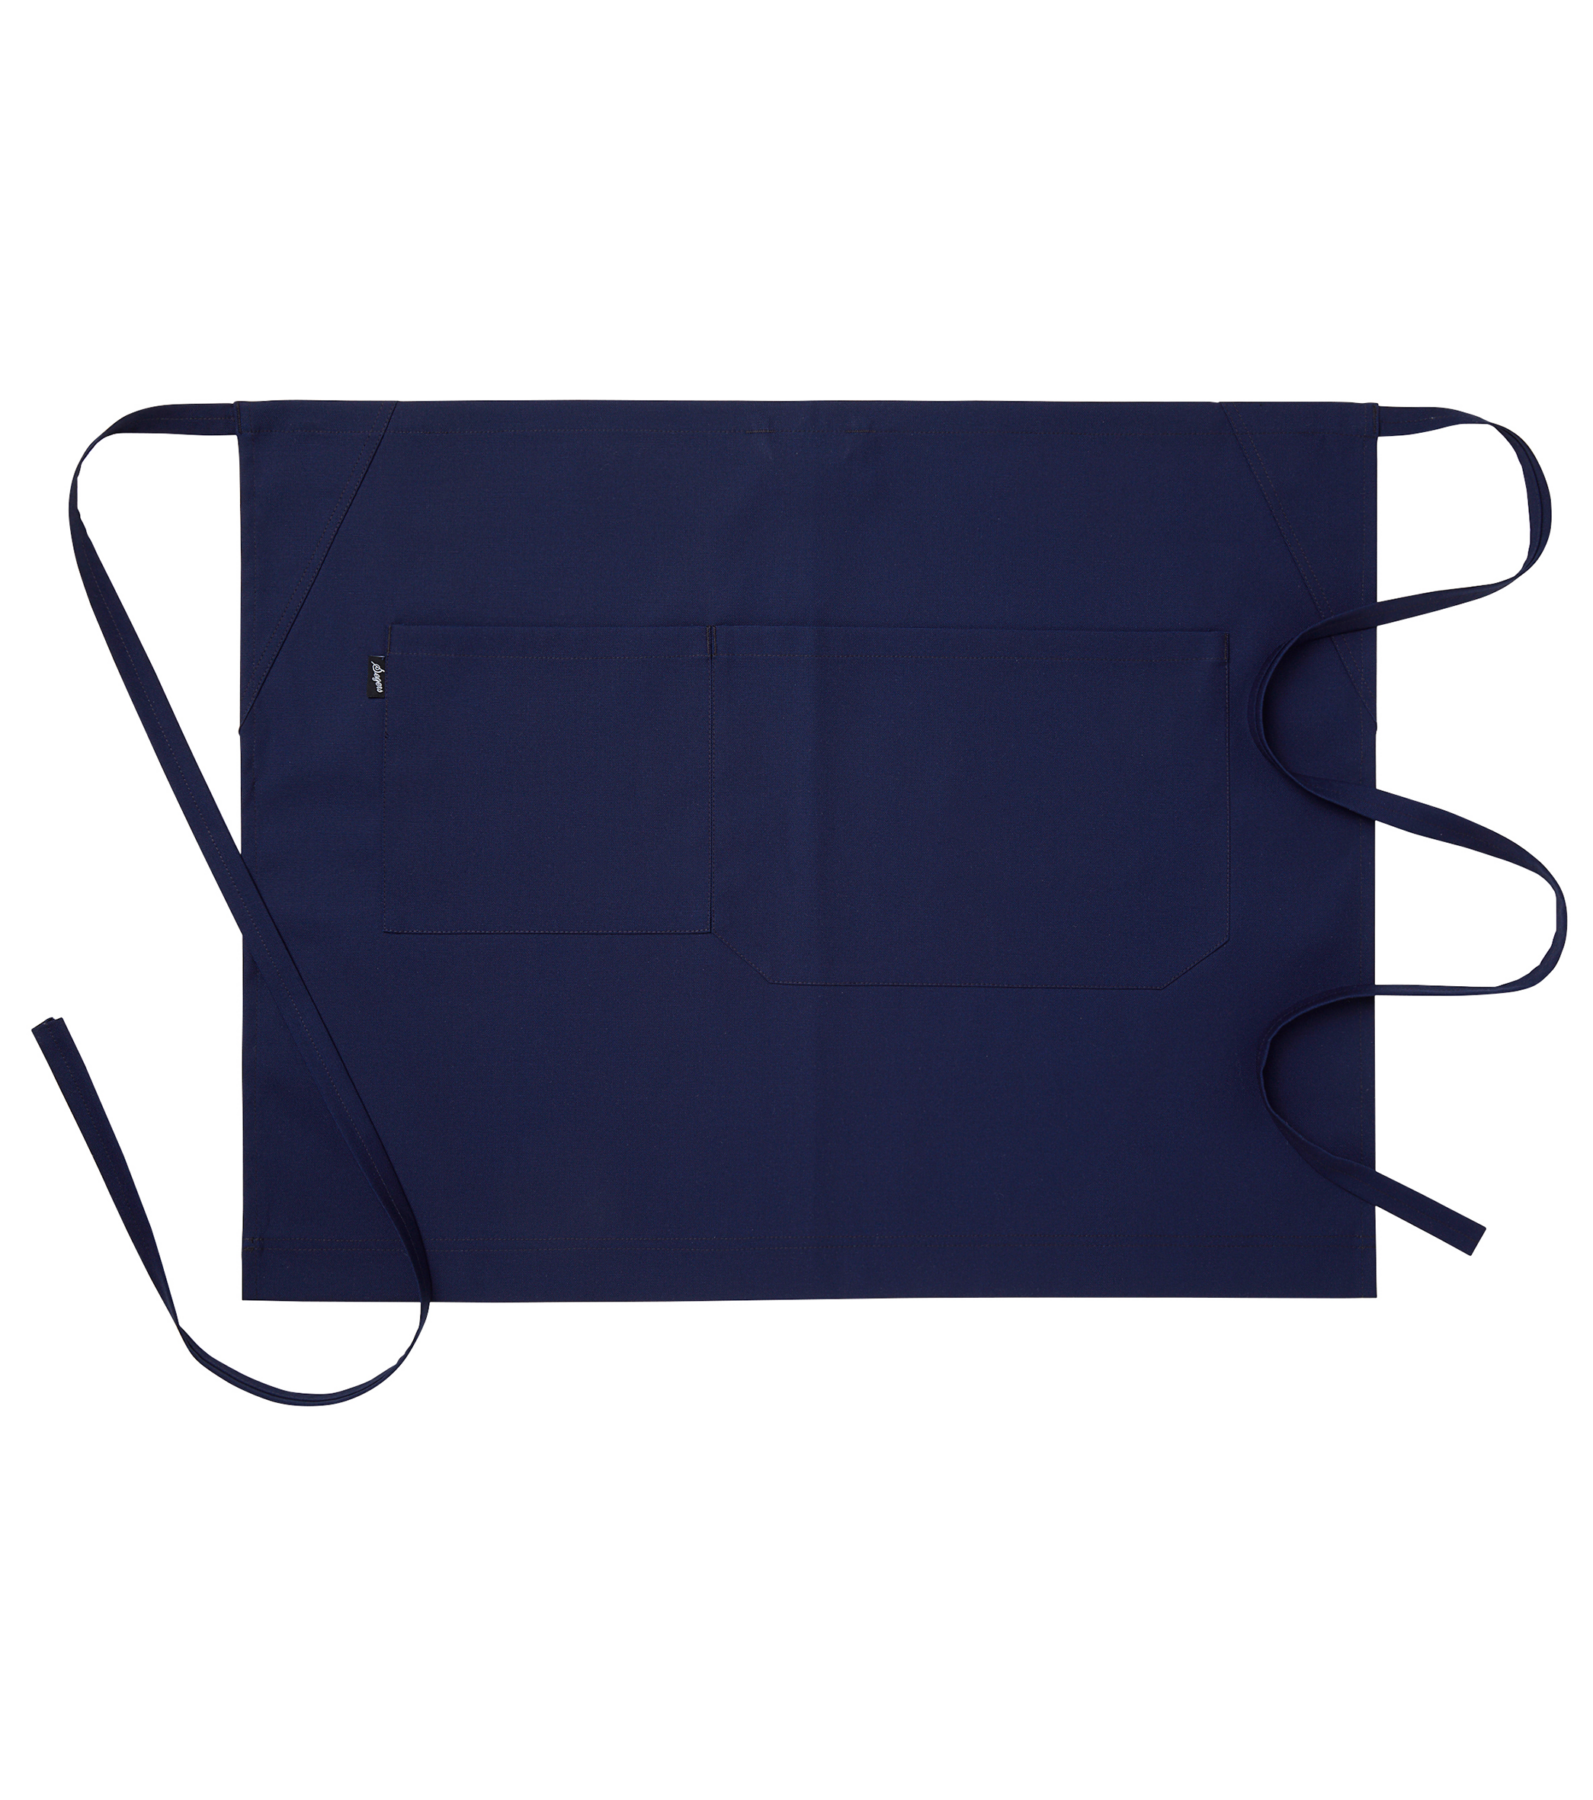 sloof in marine blauw